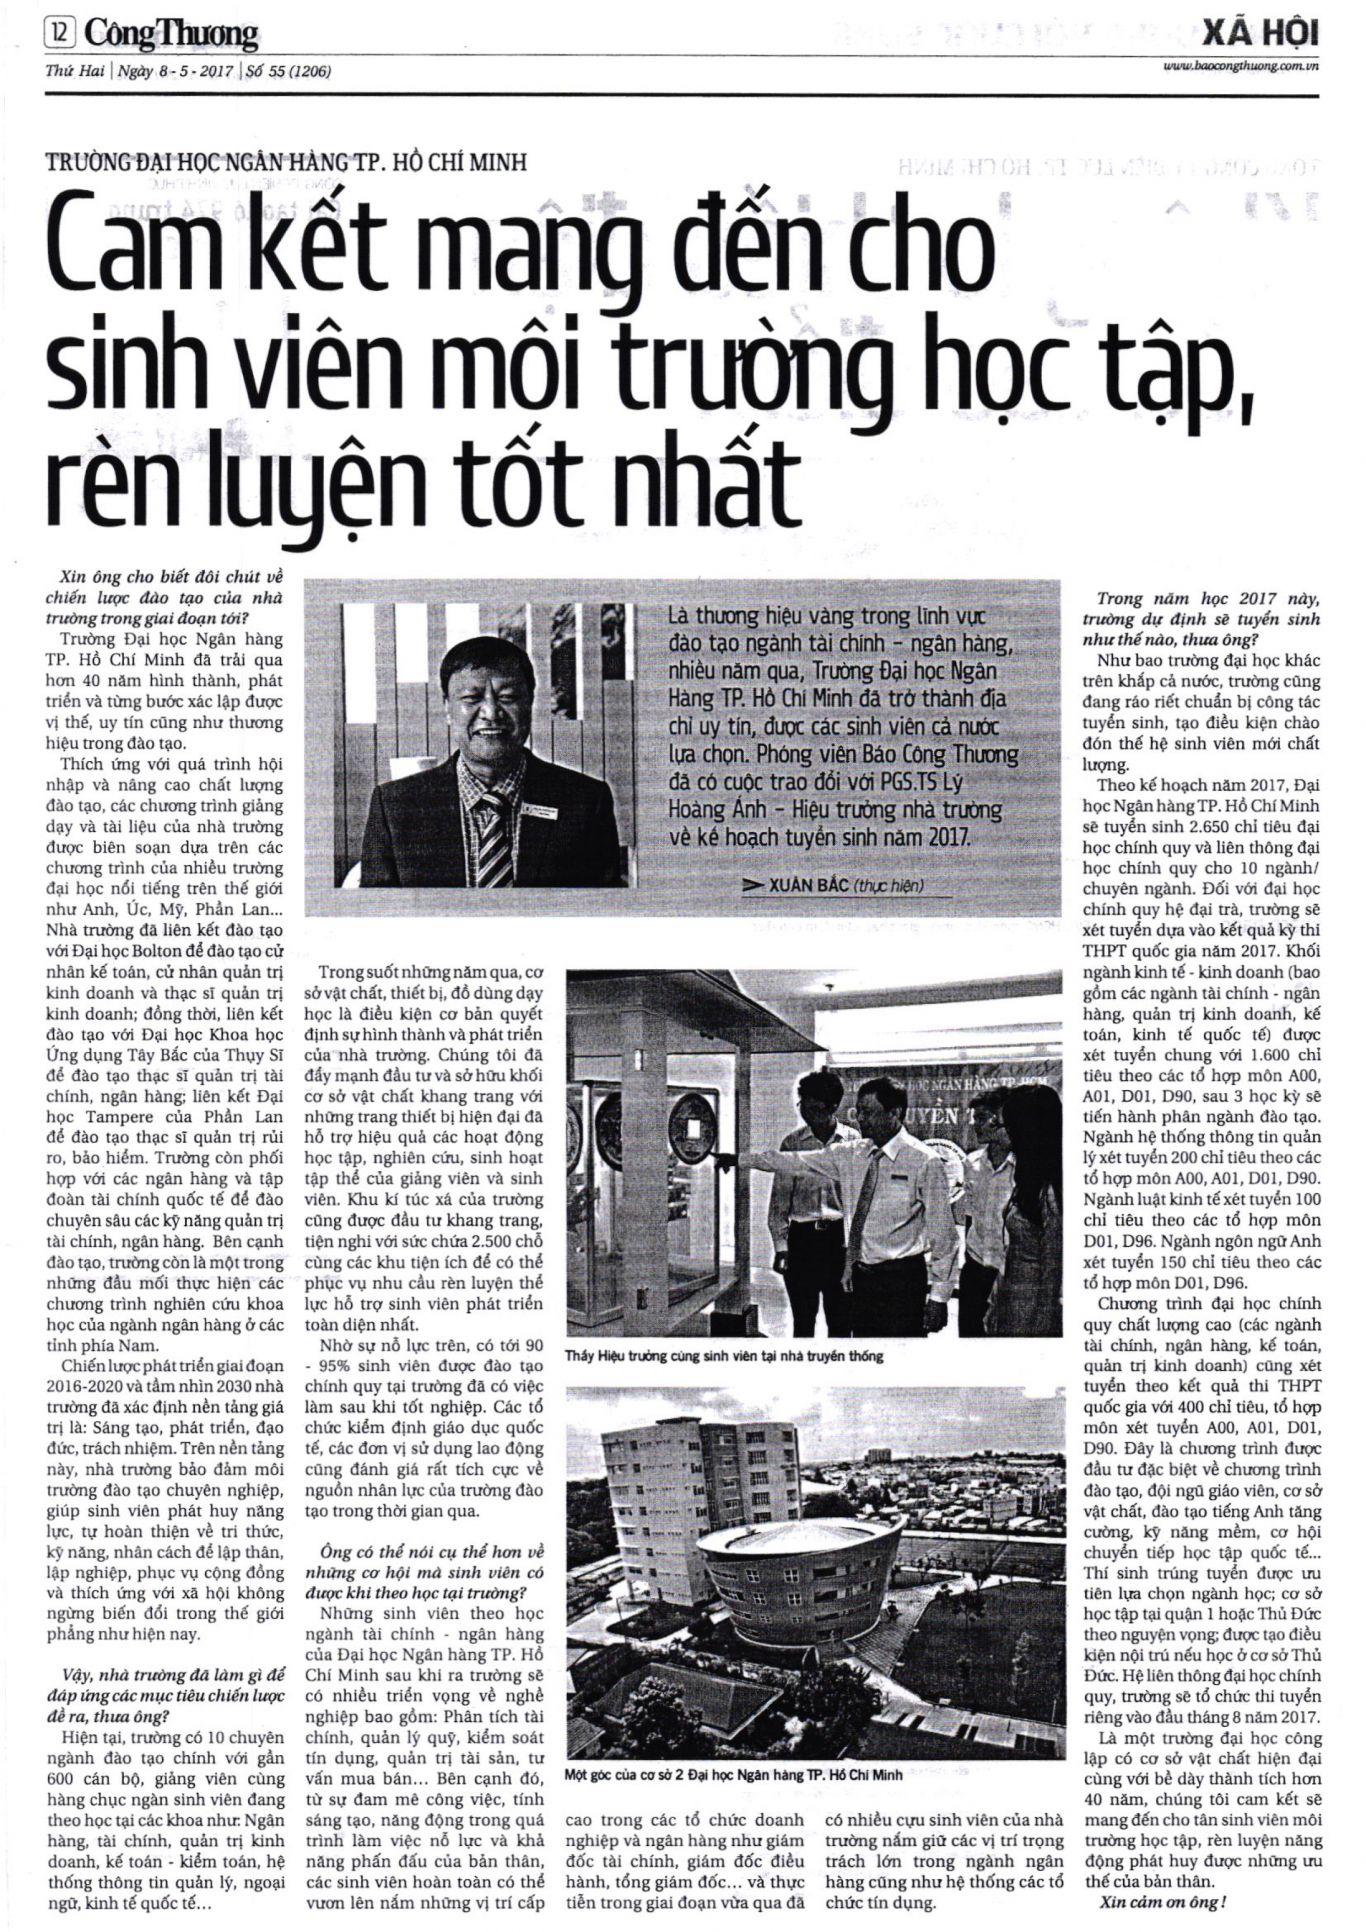 bao_cong_thuong_dua_tin_truong_dhnh_cam_ket_mang_den_cho_sinh_vien_moi_truong_hoc_tap_ren_luyen_tot_nhat-15_53_01_297